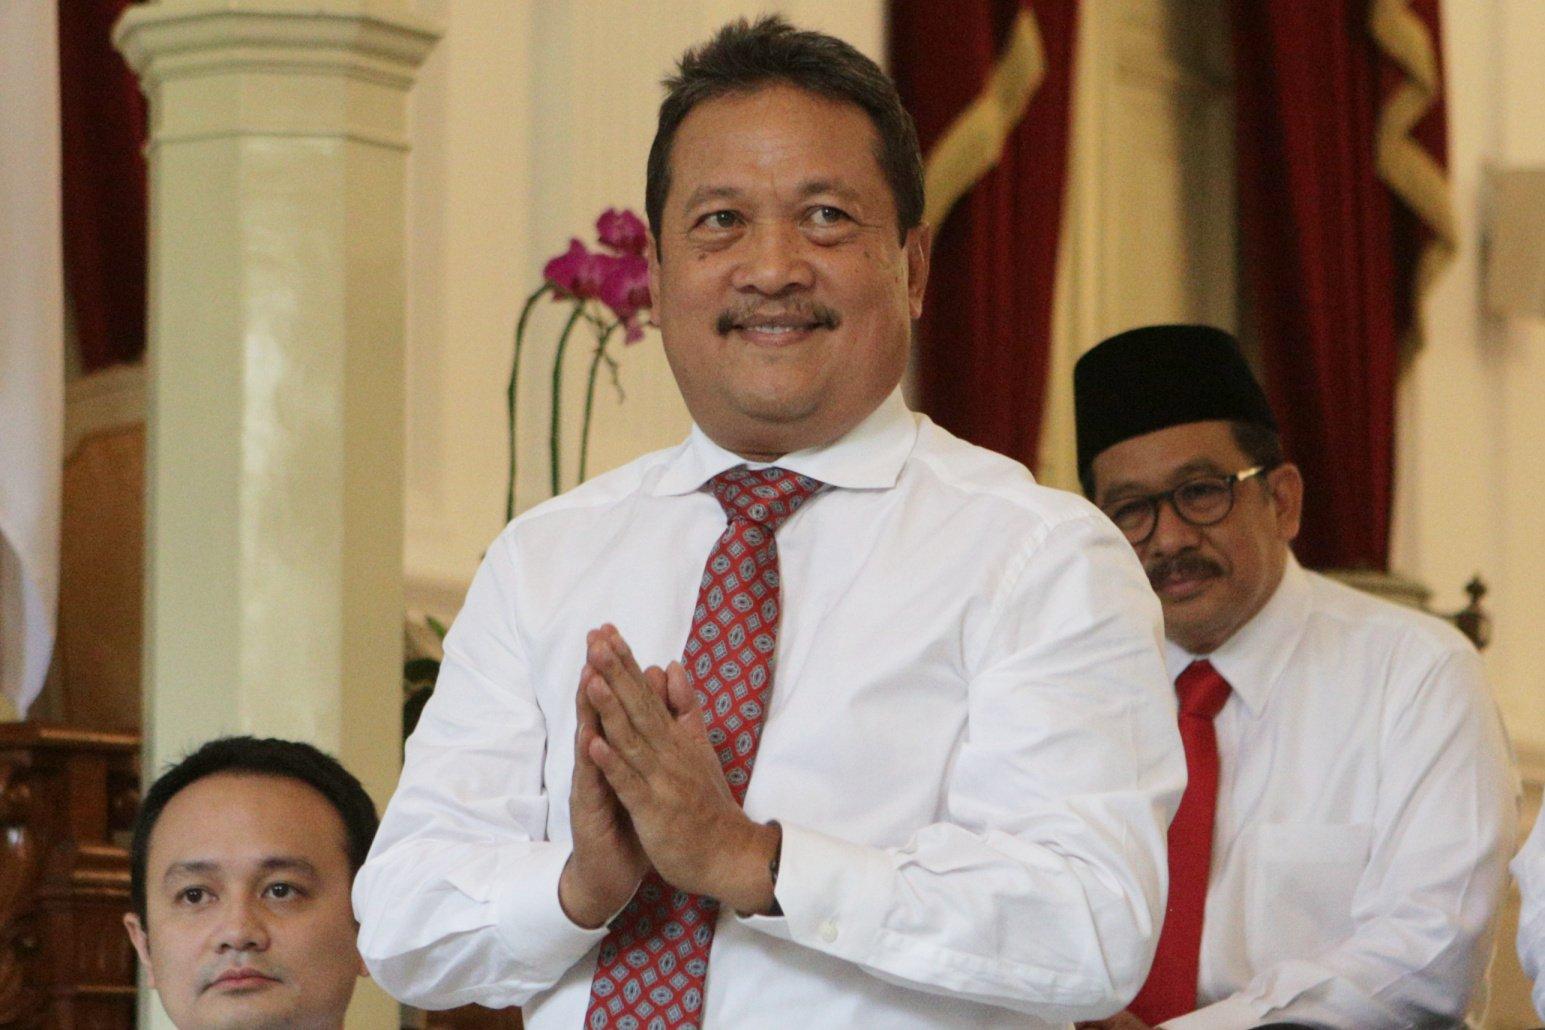 Wakil Menteri Pertahanan, Wahyu Sakti Trenggono di Istana Merdeka, Jakarta Pusat (25/10/2019). Wahyu yang merupakan mantan Bendahara Tim Kampanye Nasional (TKN) Jokowi-Ma'ruf akan berkolaborasi dengan Menteri Pertahanan Prabowo Subianto.